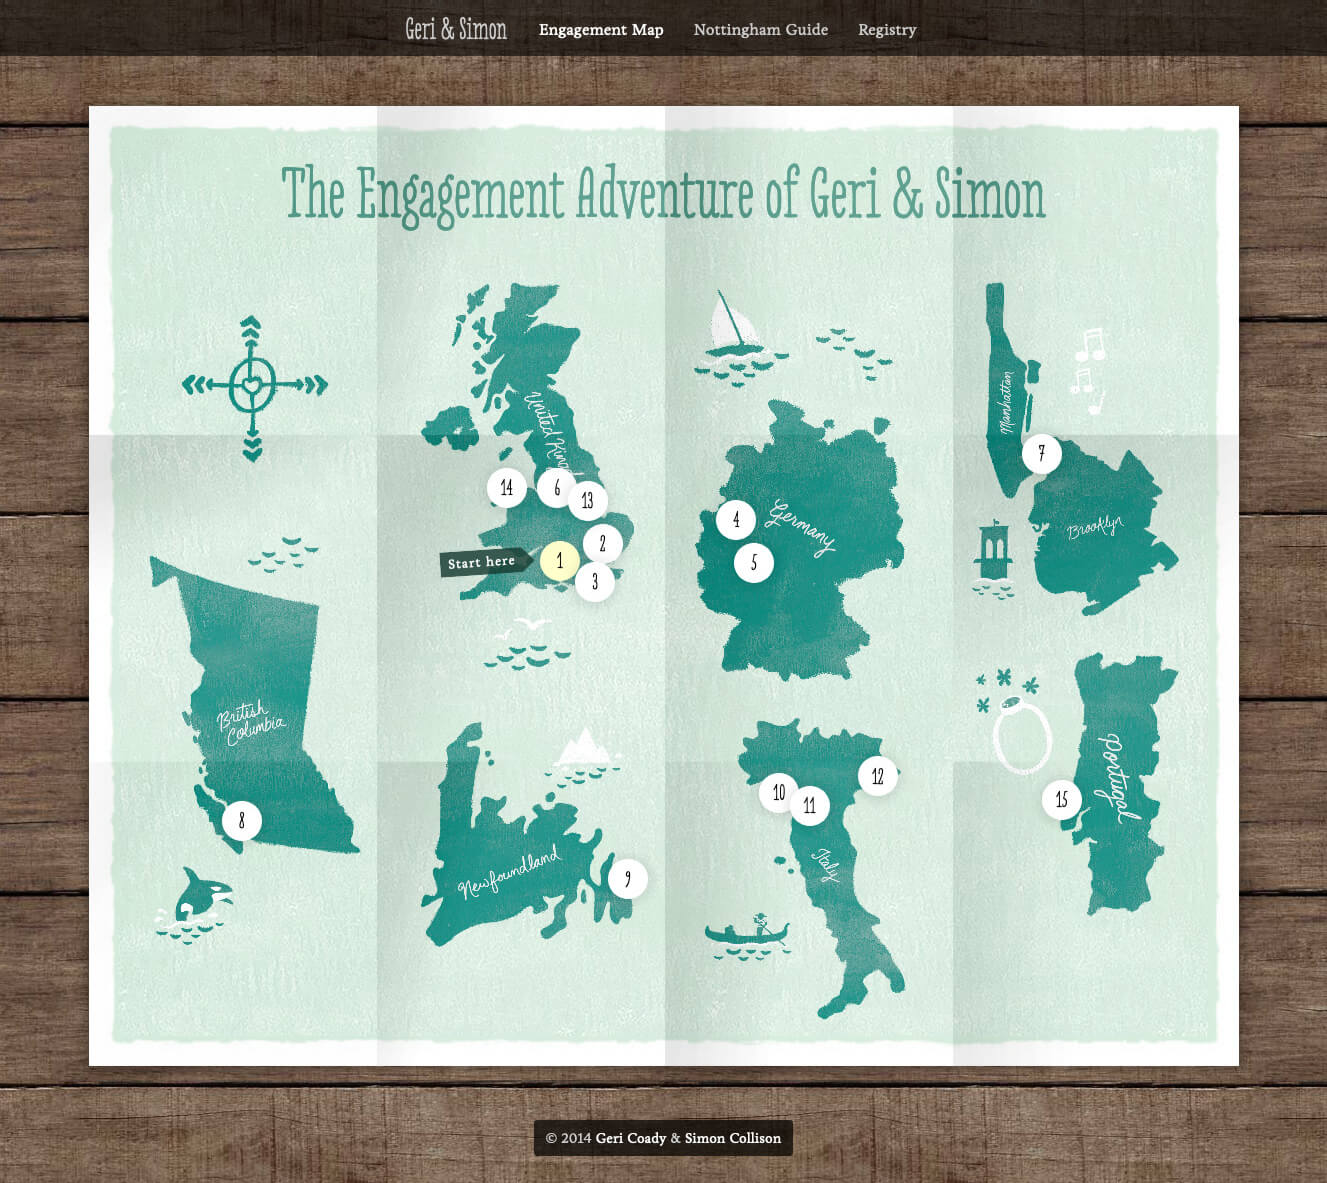 Web interactive responsive engagement map